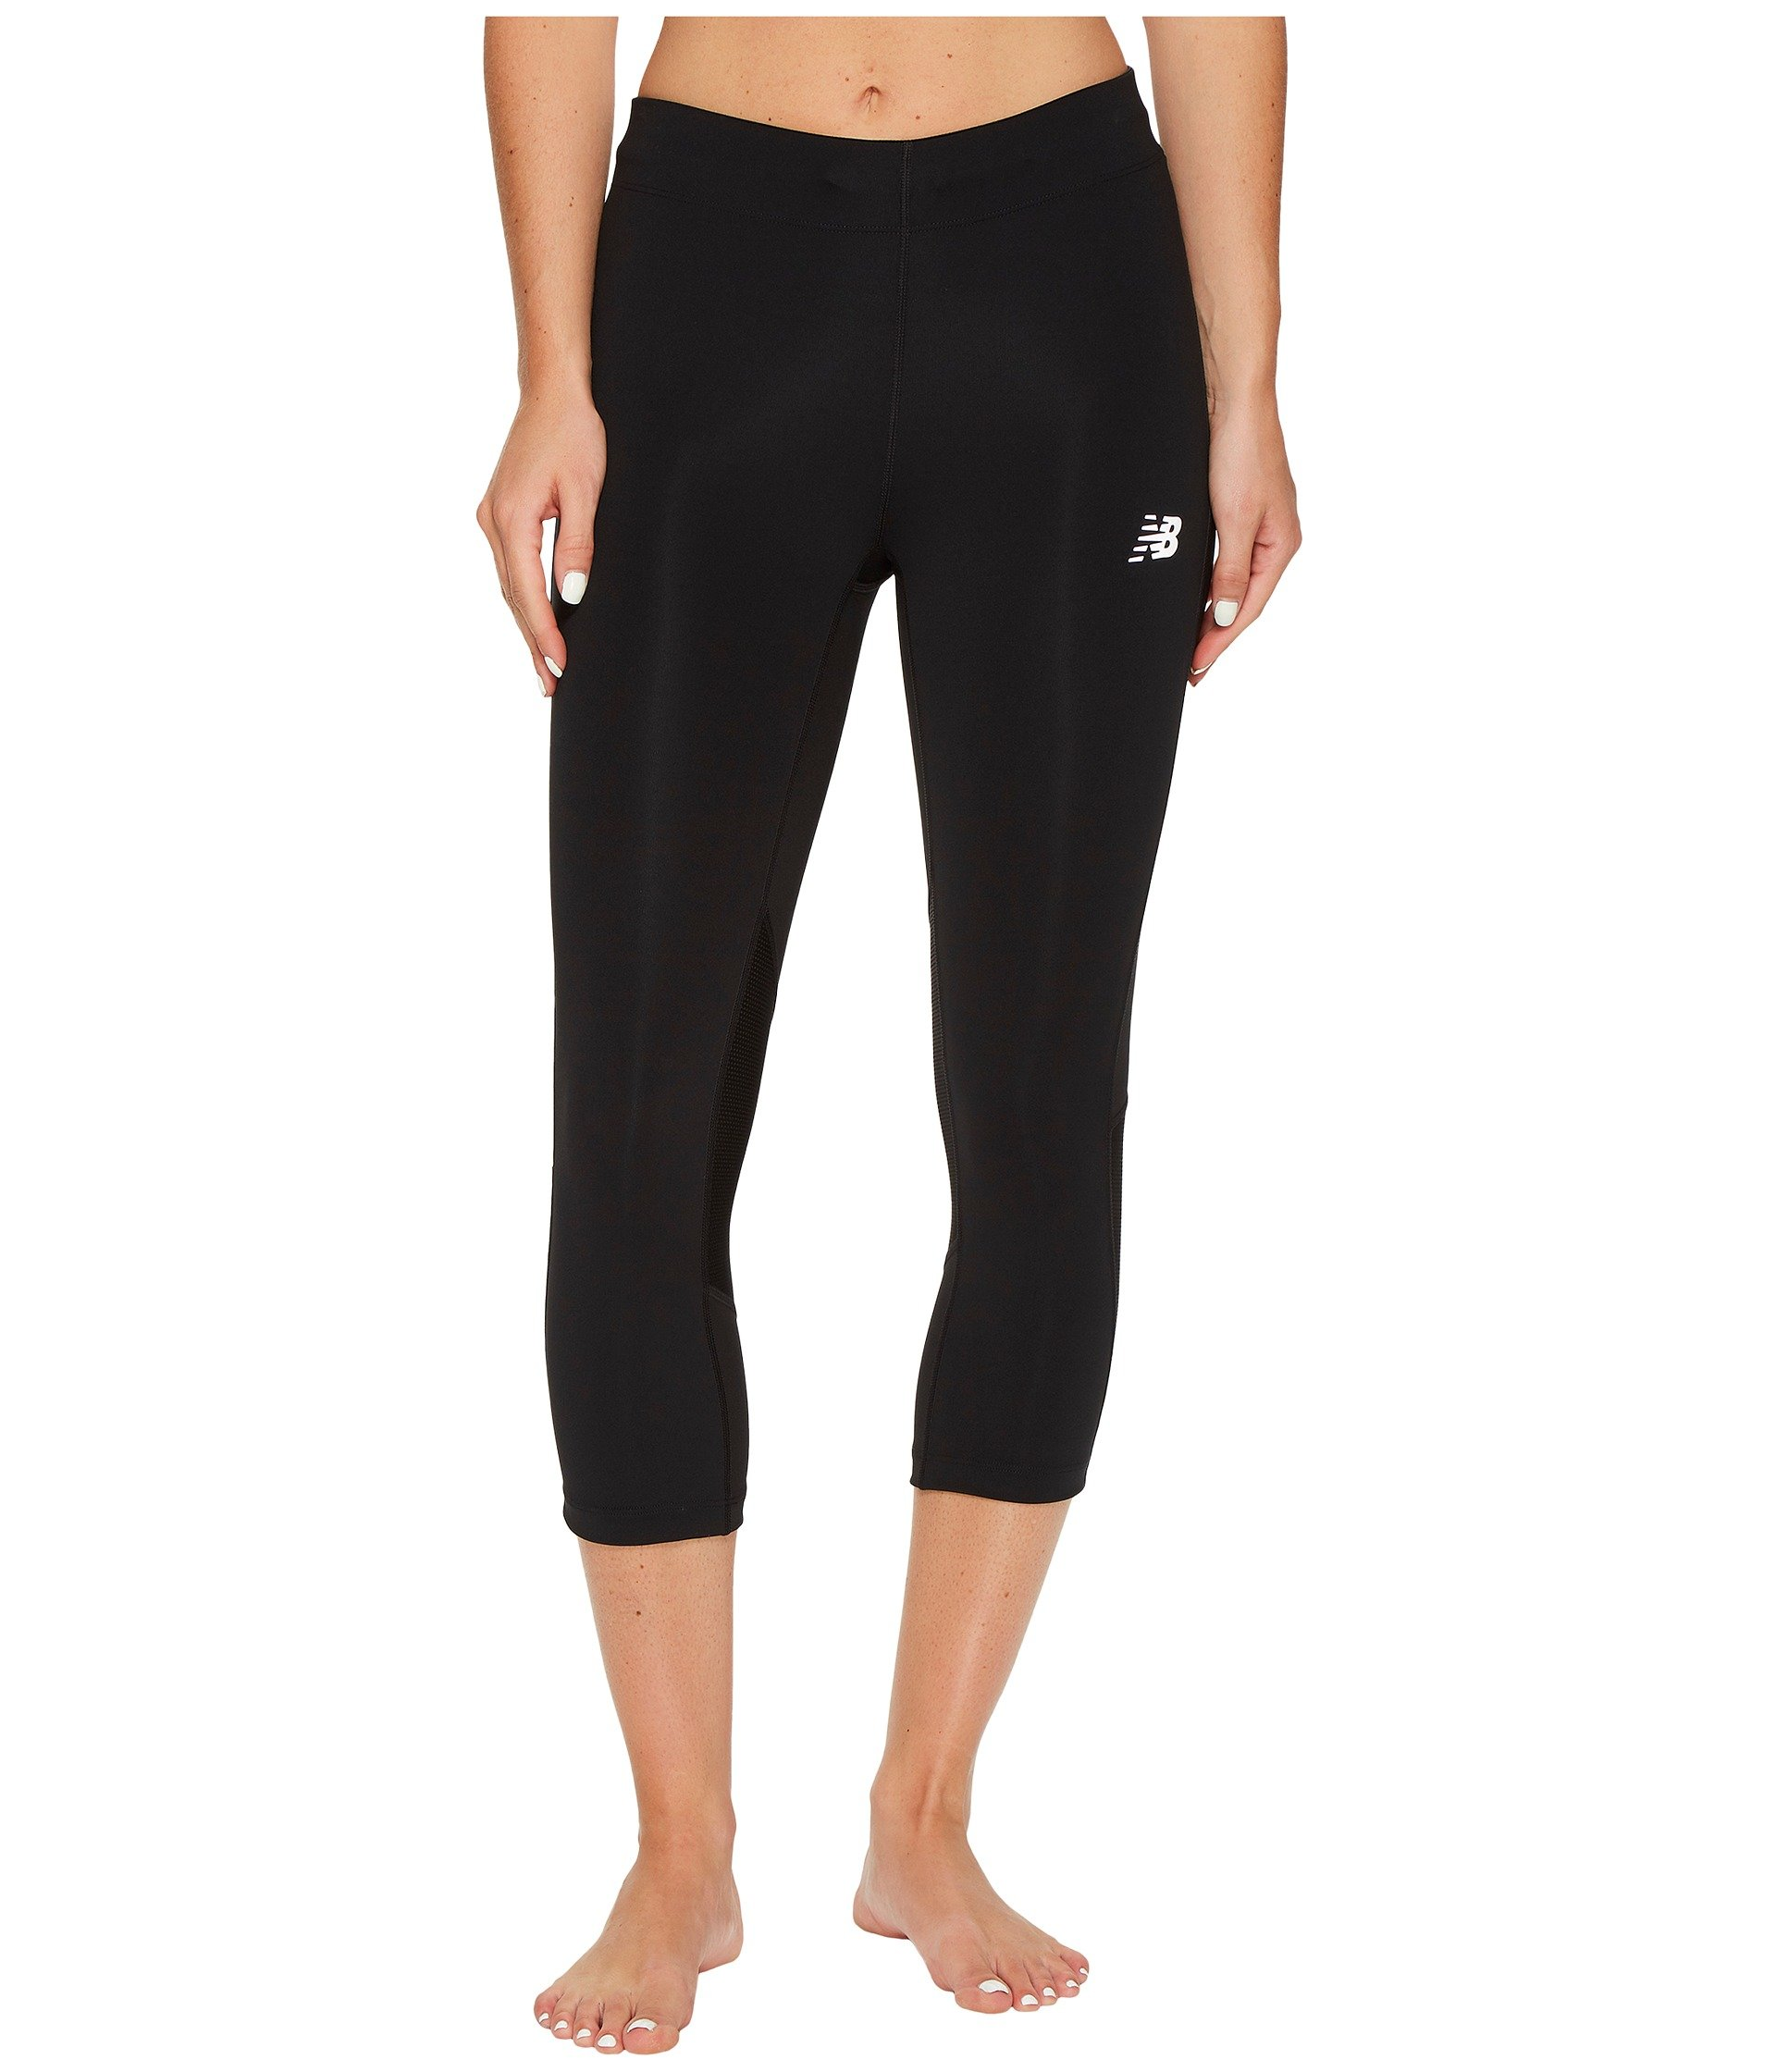 New Balance Women's Impact Capri Pants, Black, Medium